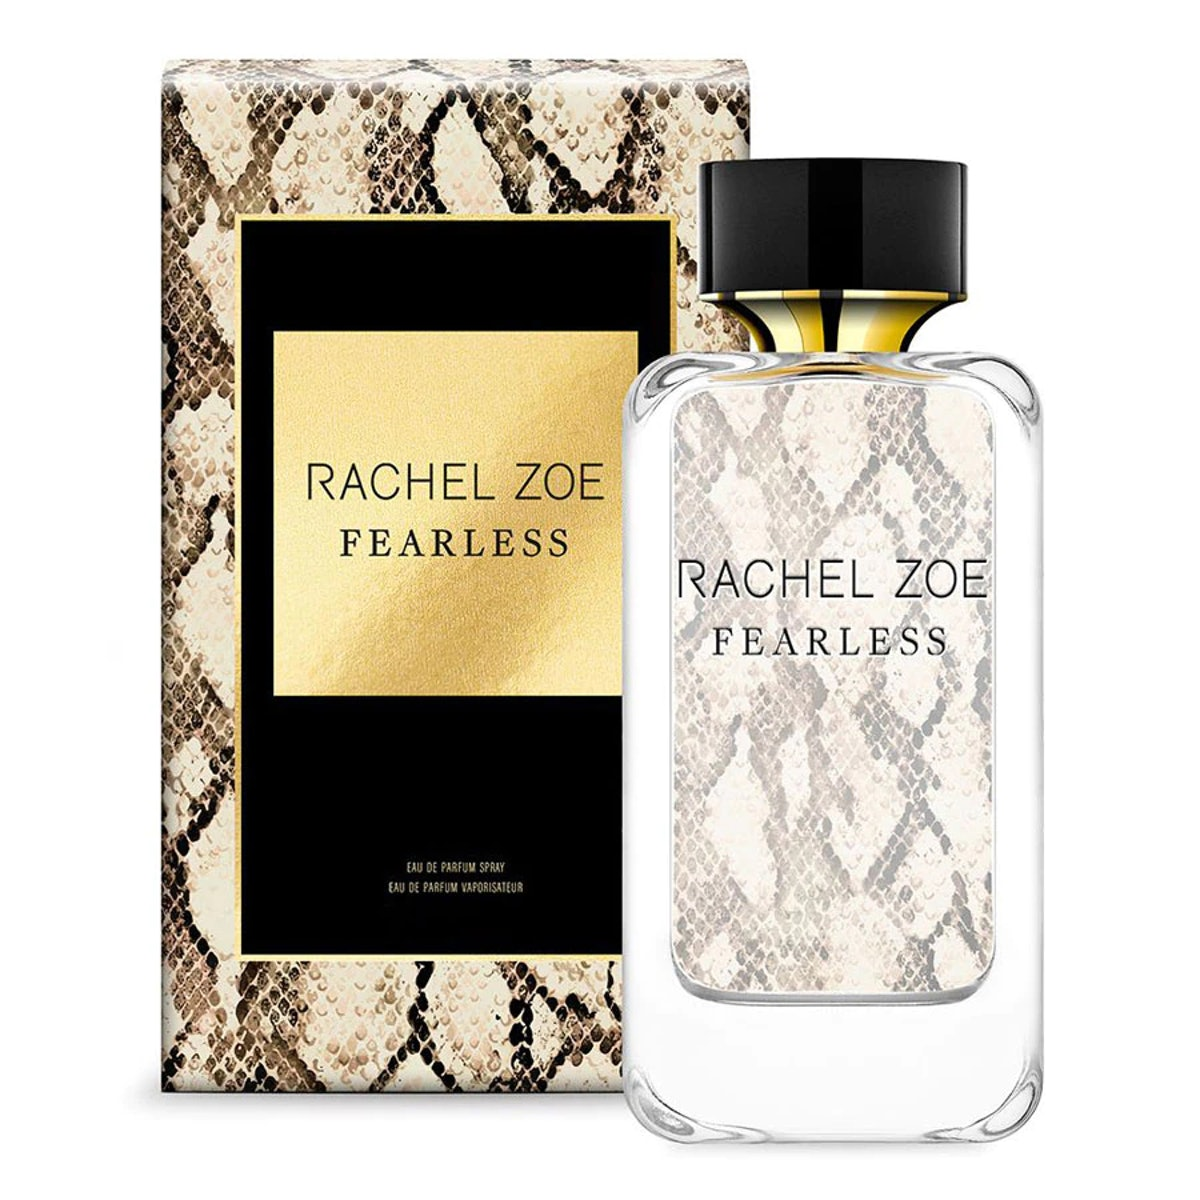 Fearless Eau de Parfum Spray